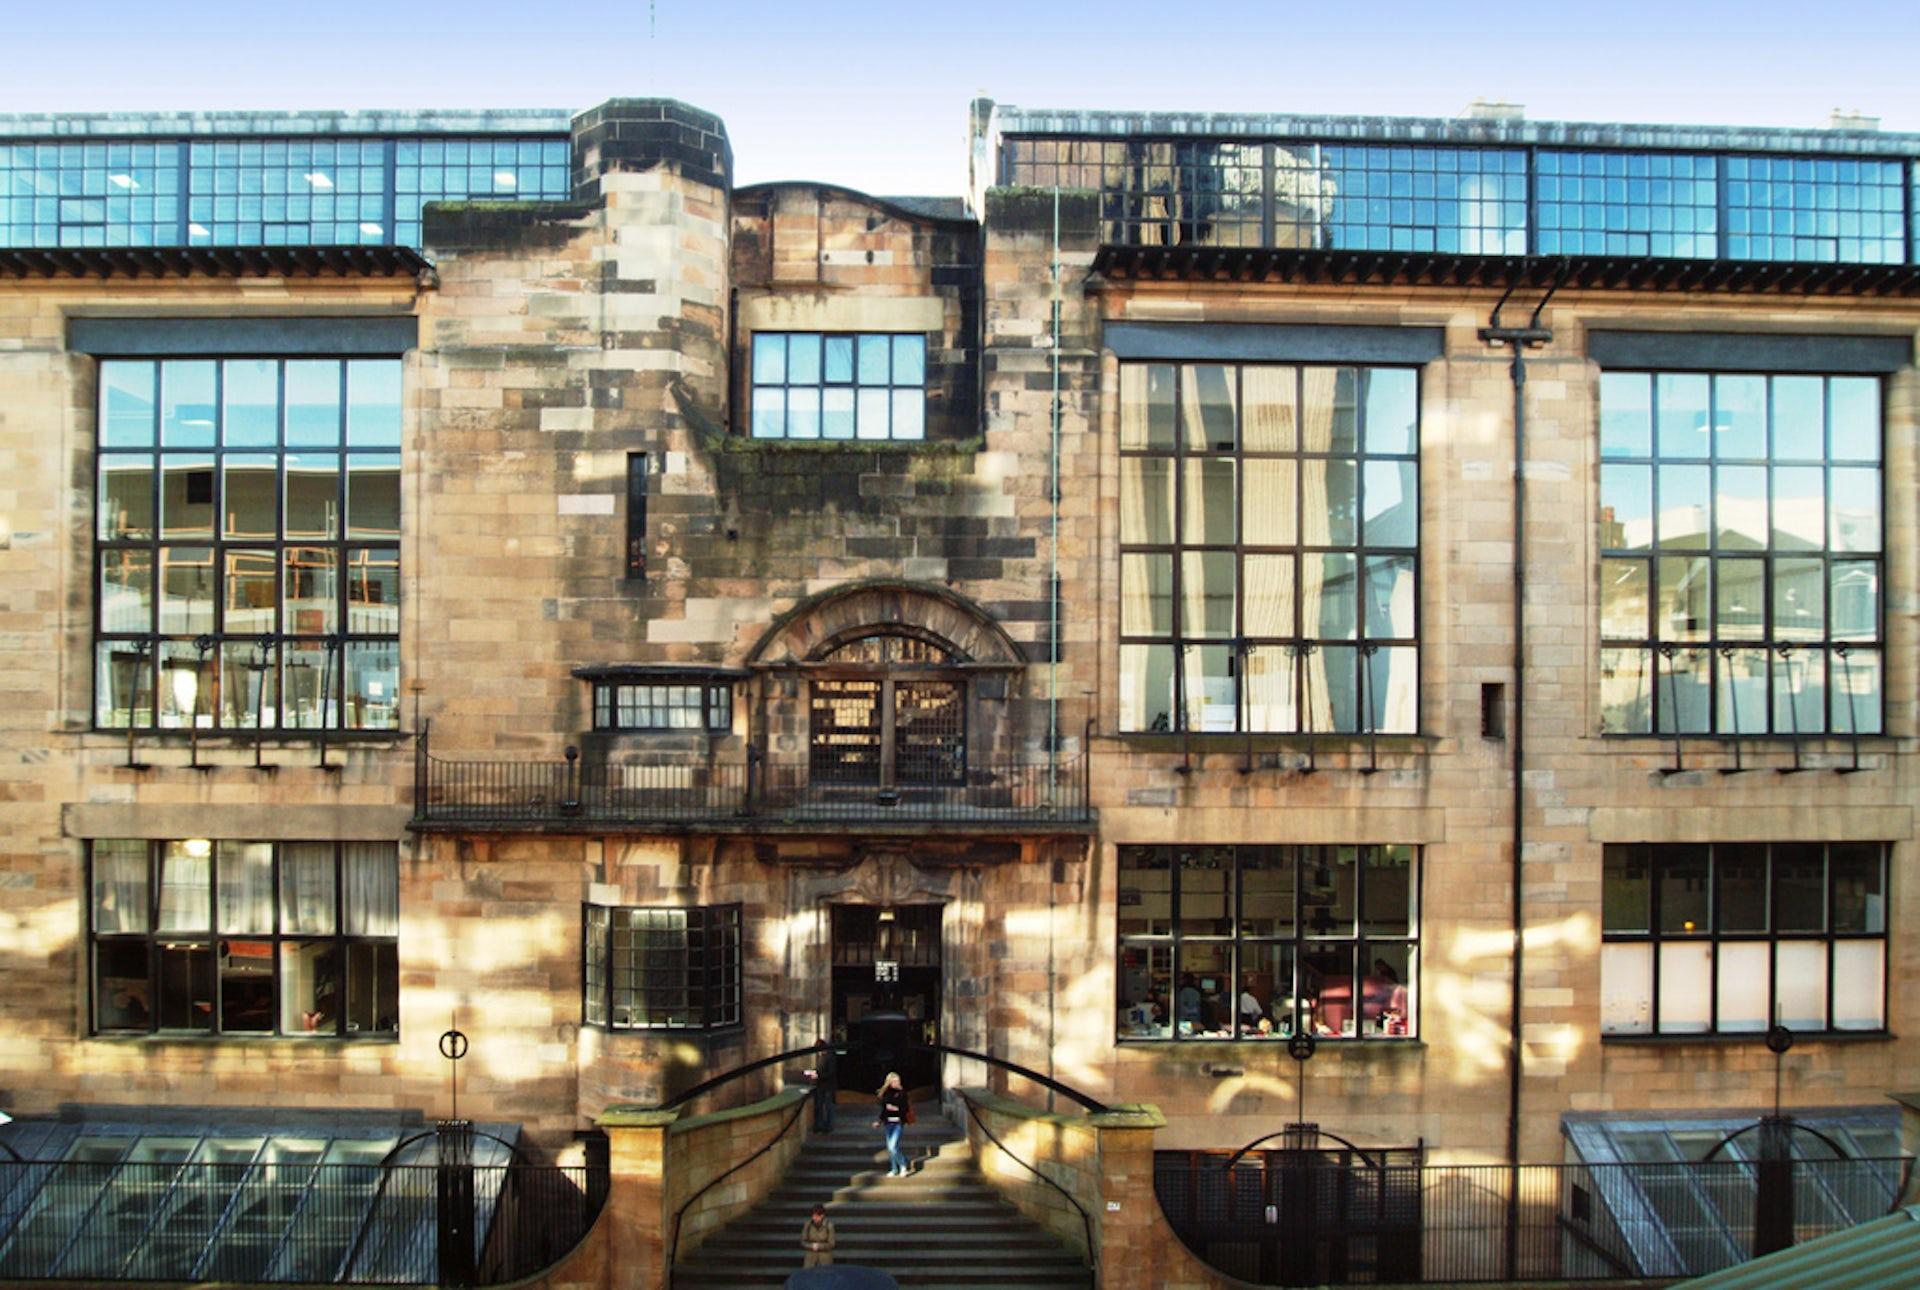 The Alice In Wonderland Effect Of Glasgow School Of Art